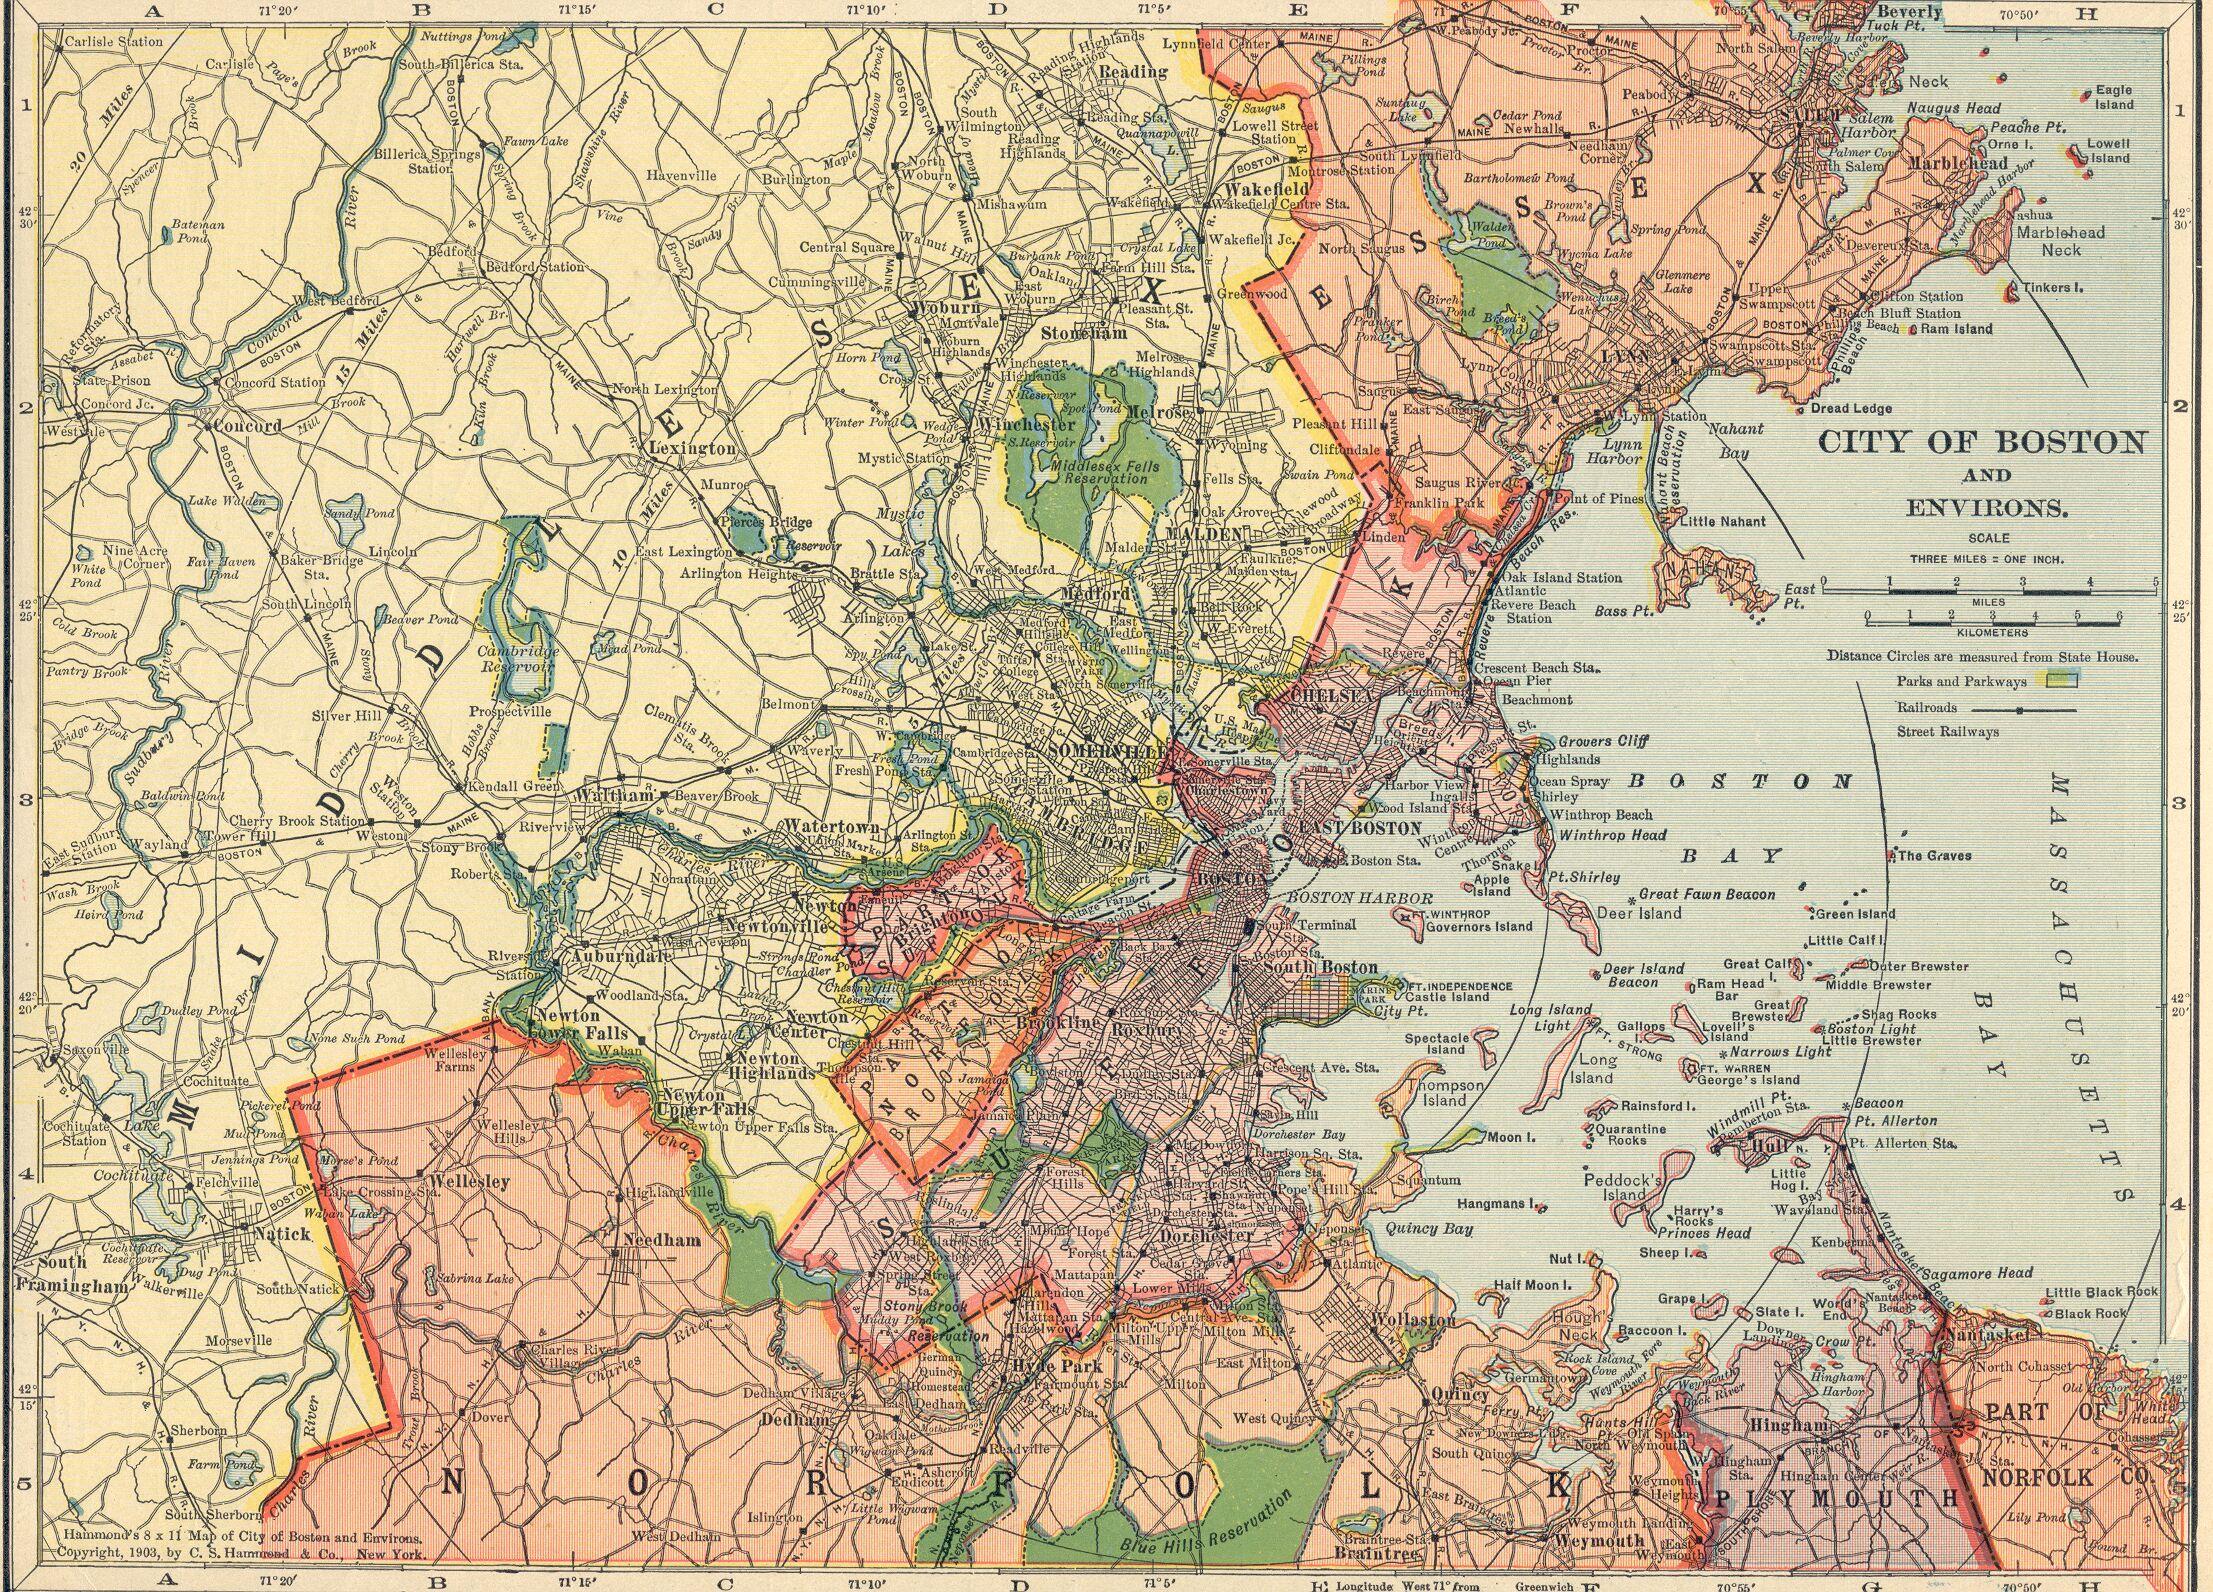 US Urban Regions From Hammonds Atlas LegalTowns - Boston on us map